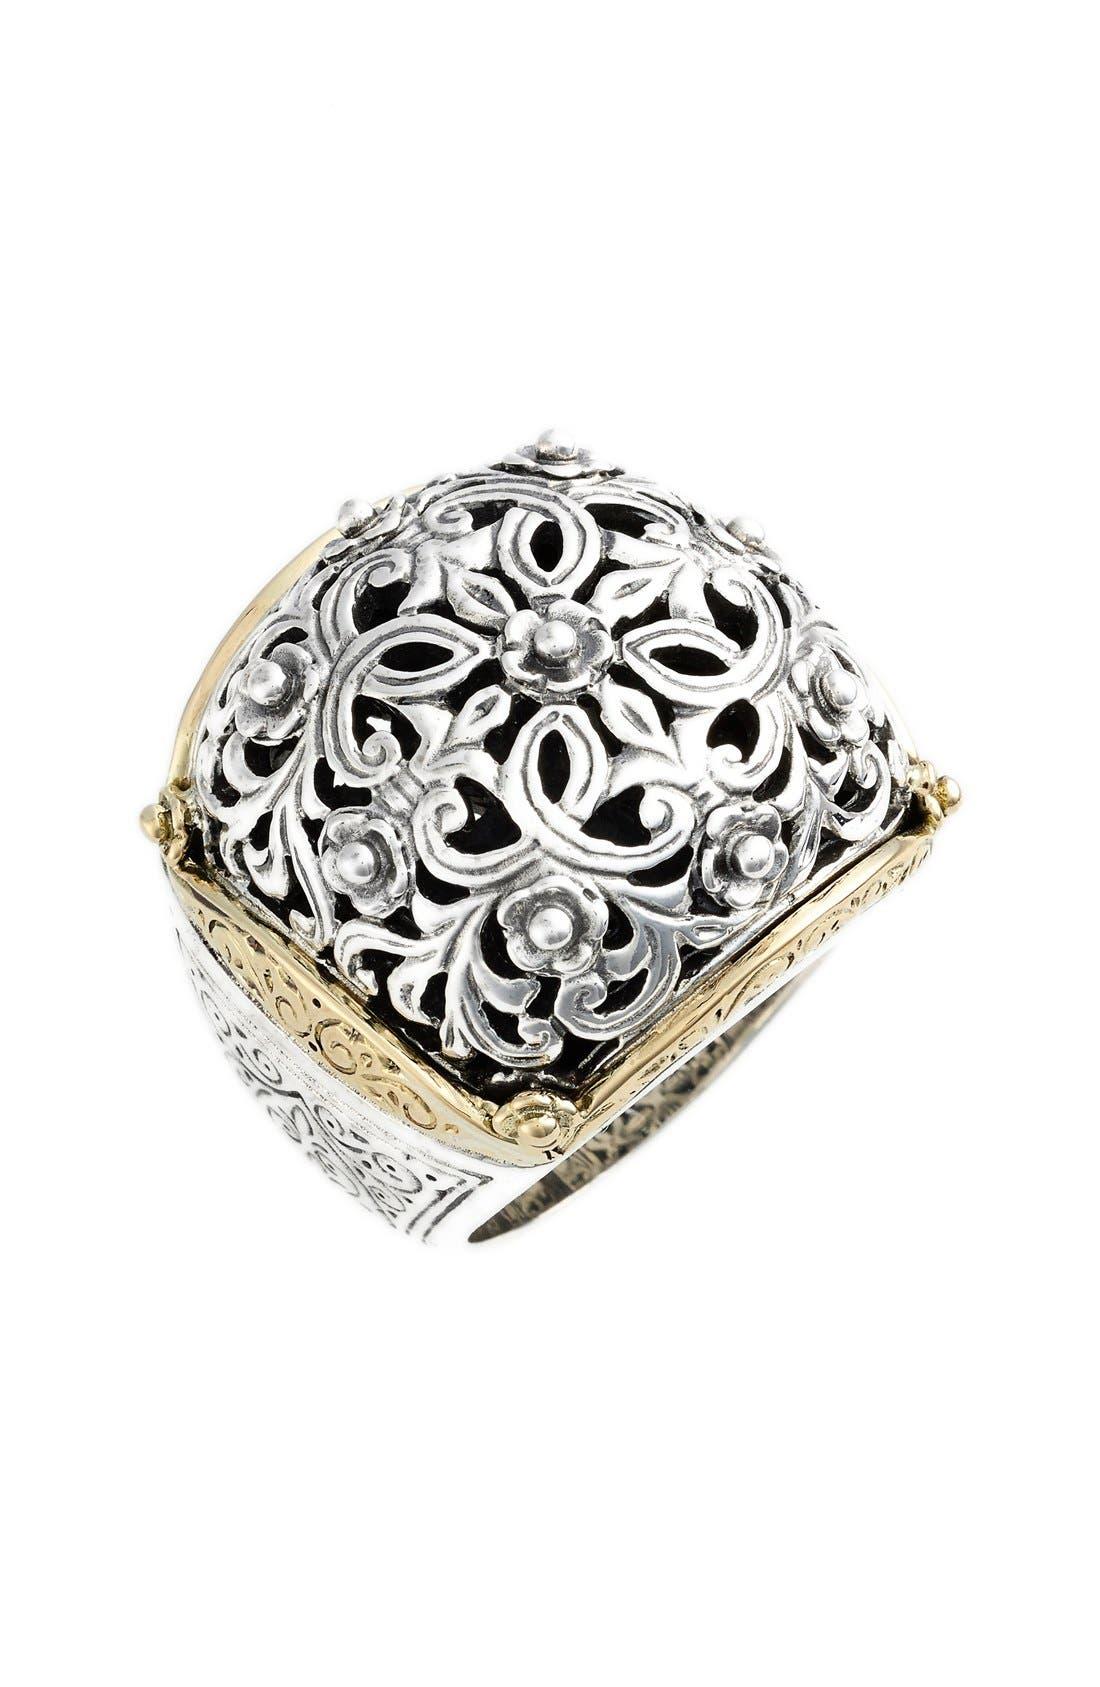 'Silver & Gold Classics' Filigree Ring,                             Main thumbnail 1, color,                             Silver/ Gold